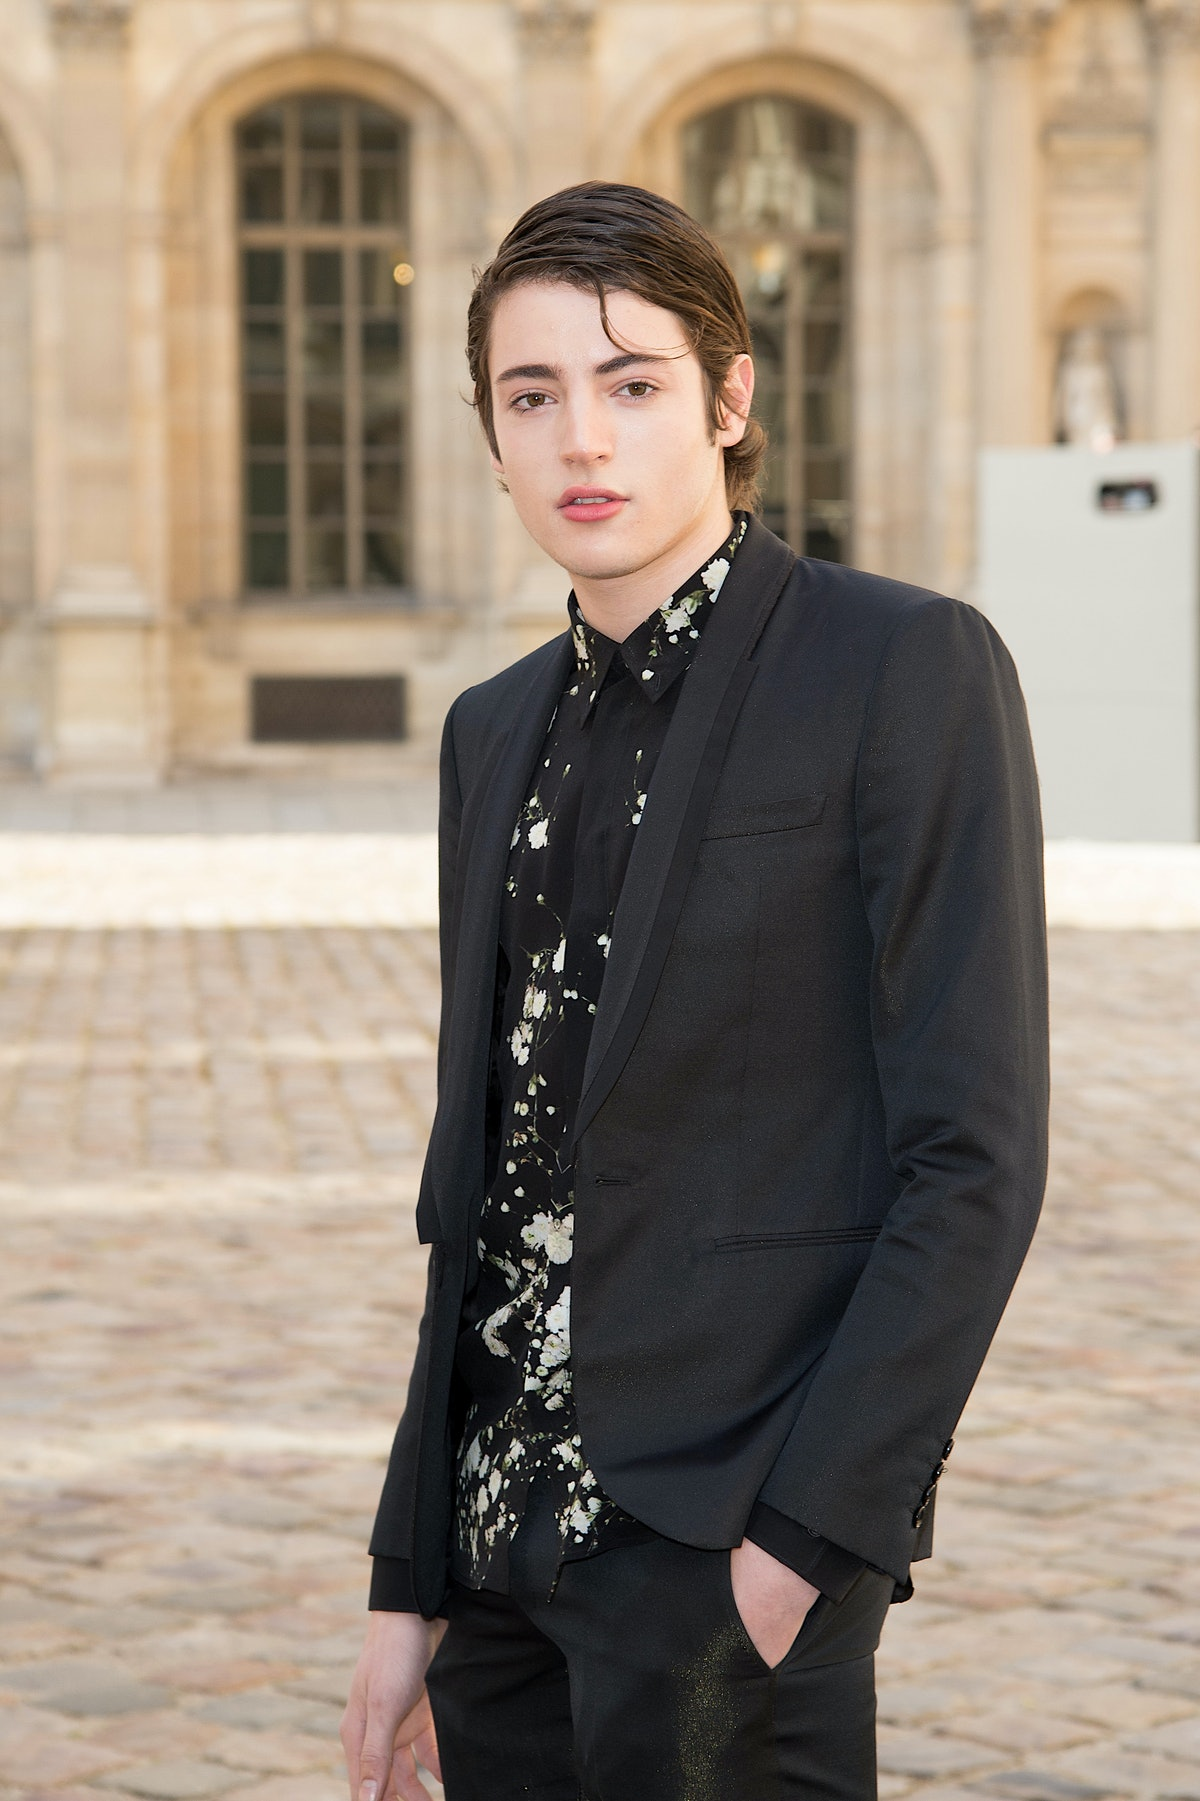 Harry Brant wearing black